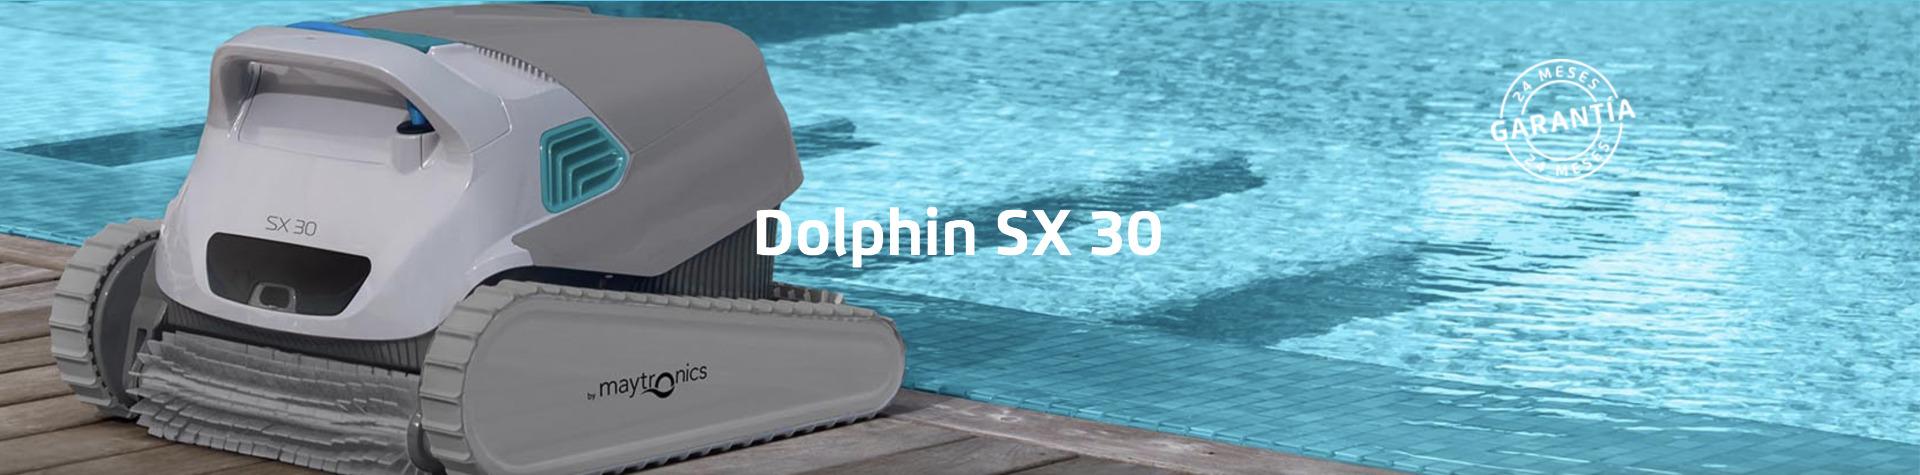 Dolphin Sx 30